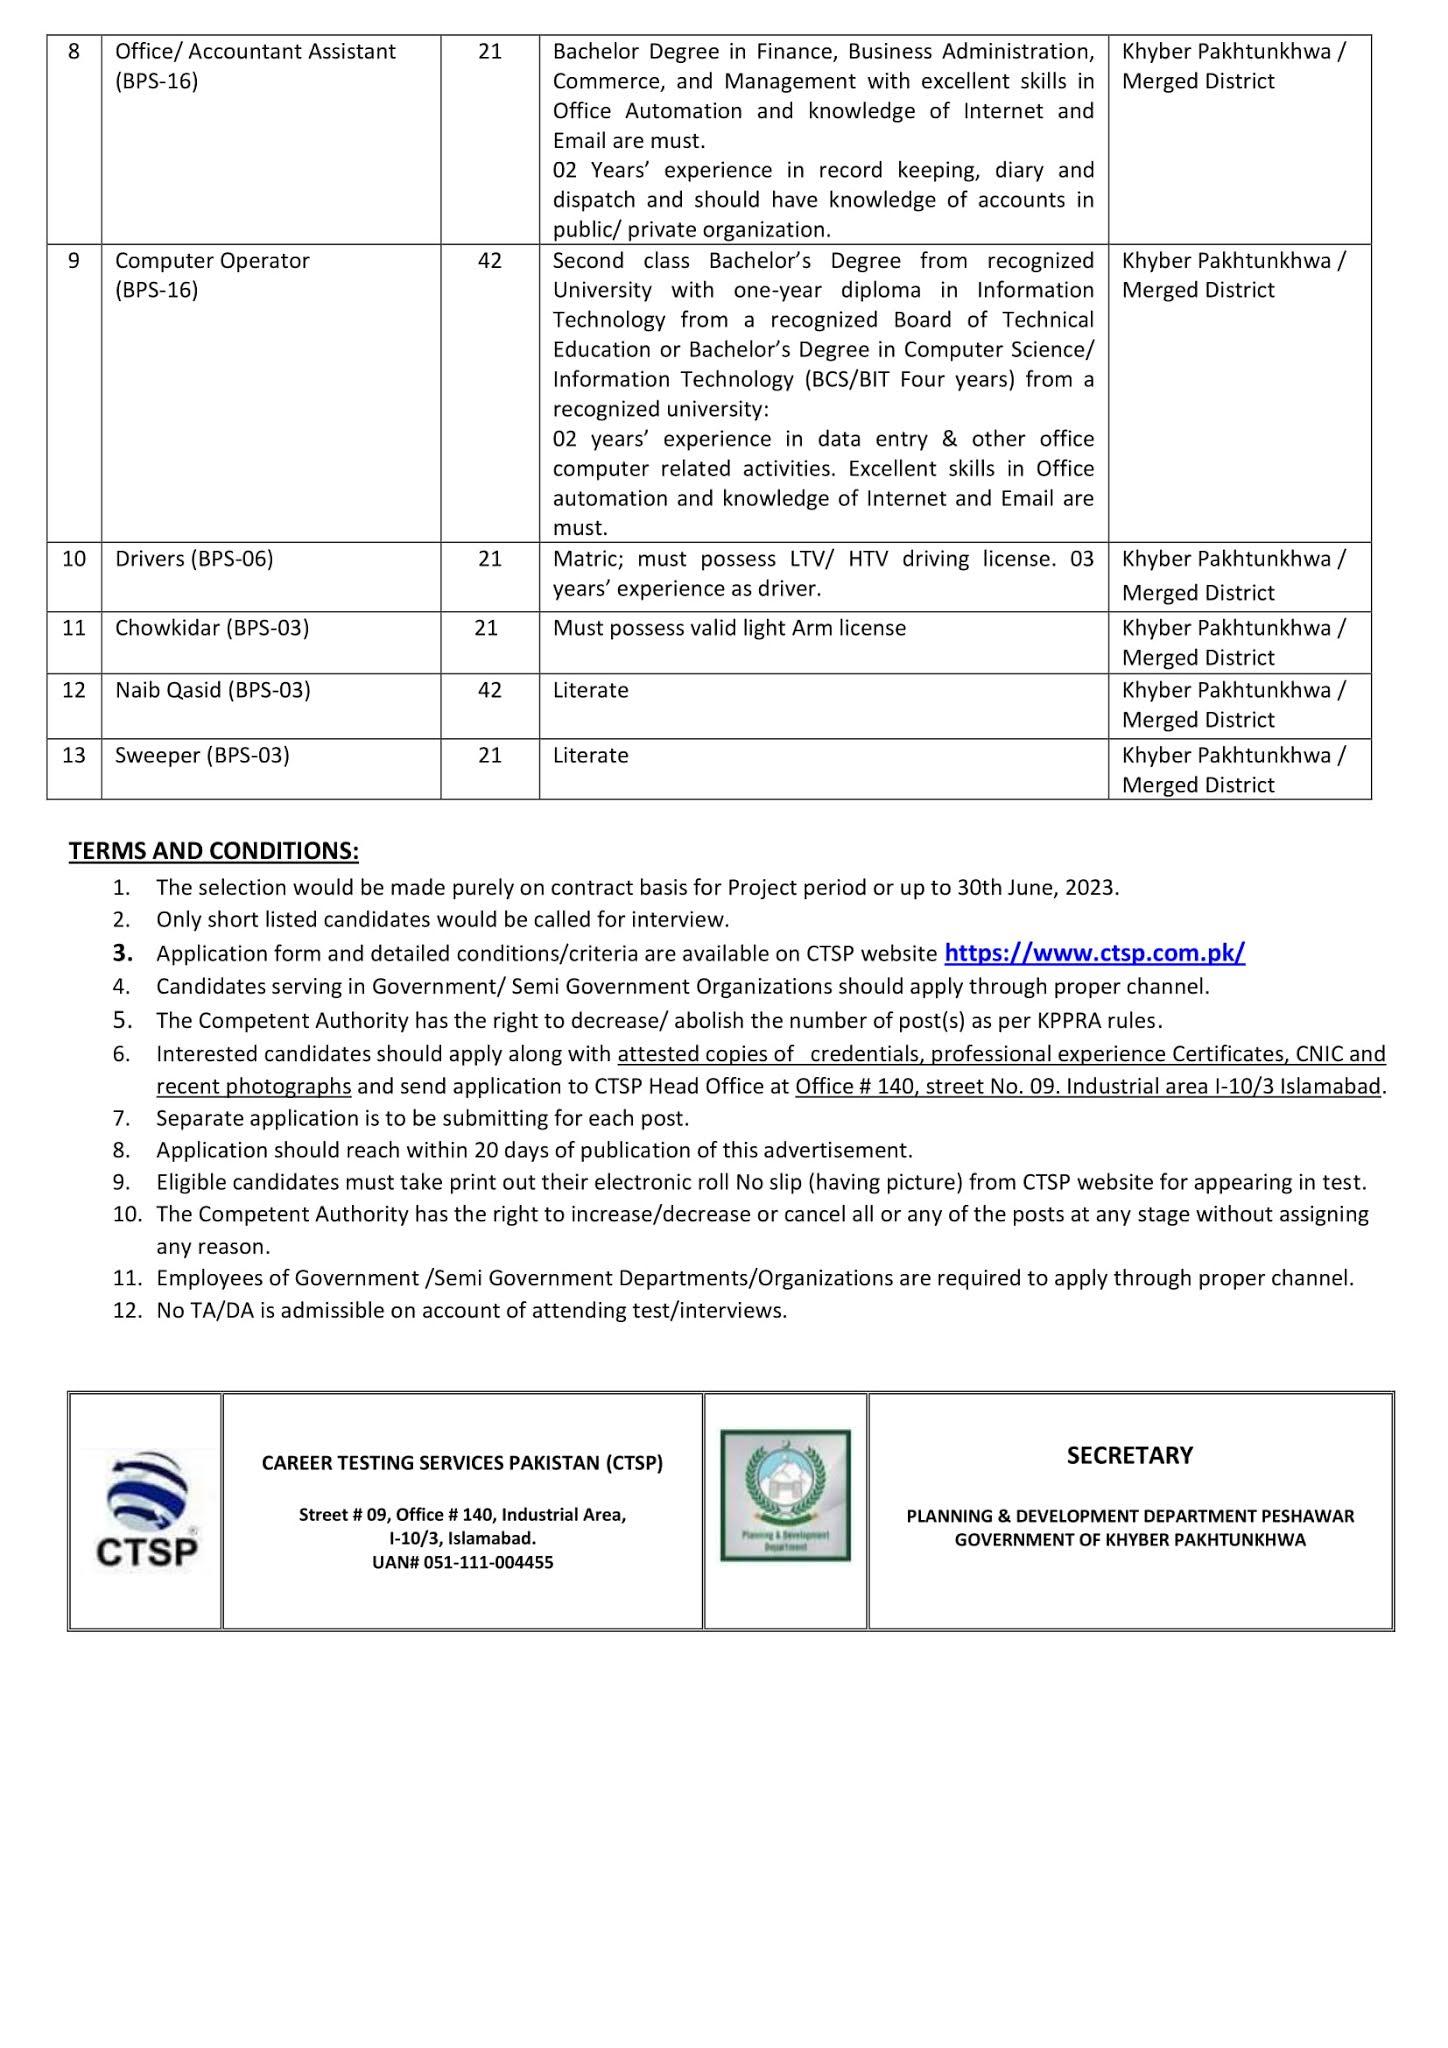 Planning and Development Department KPK Jobs Advertisement 2021